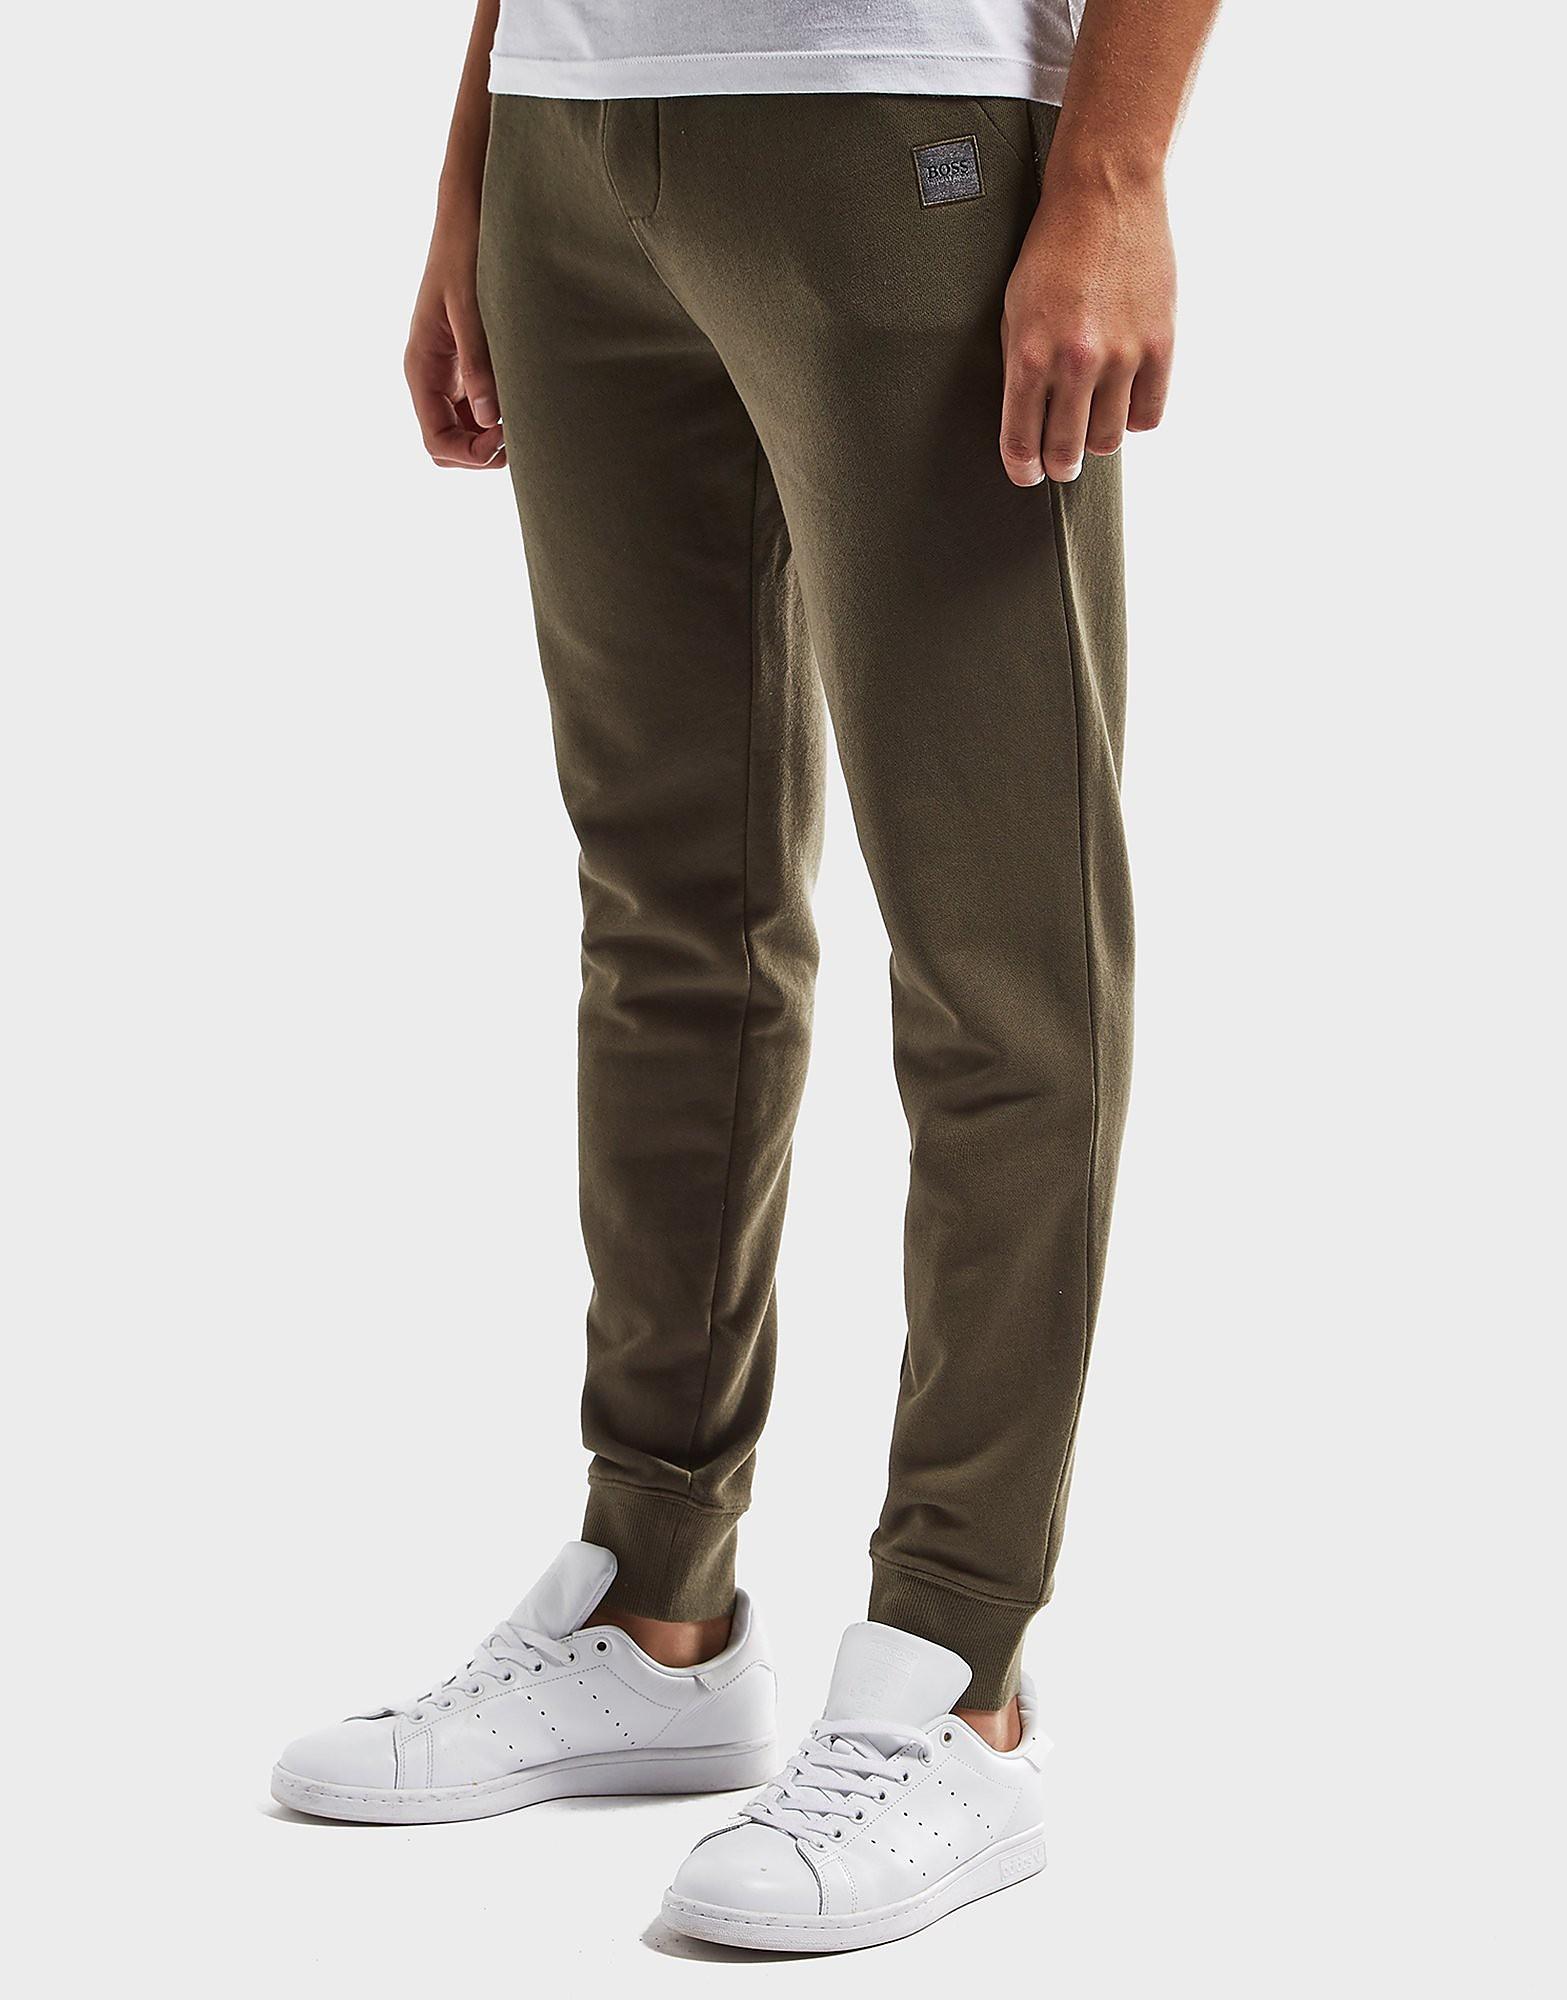 BOSS Orange South Cuffed Track Pants